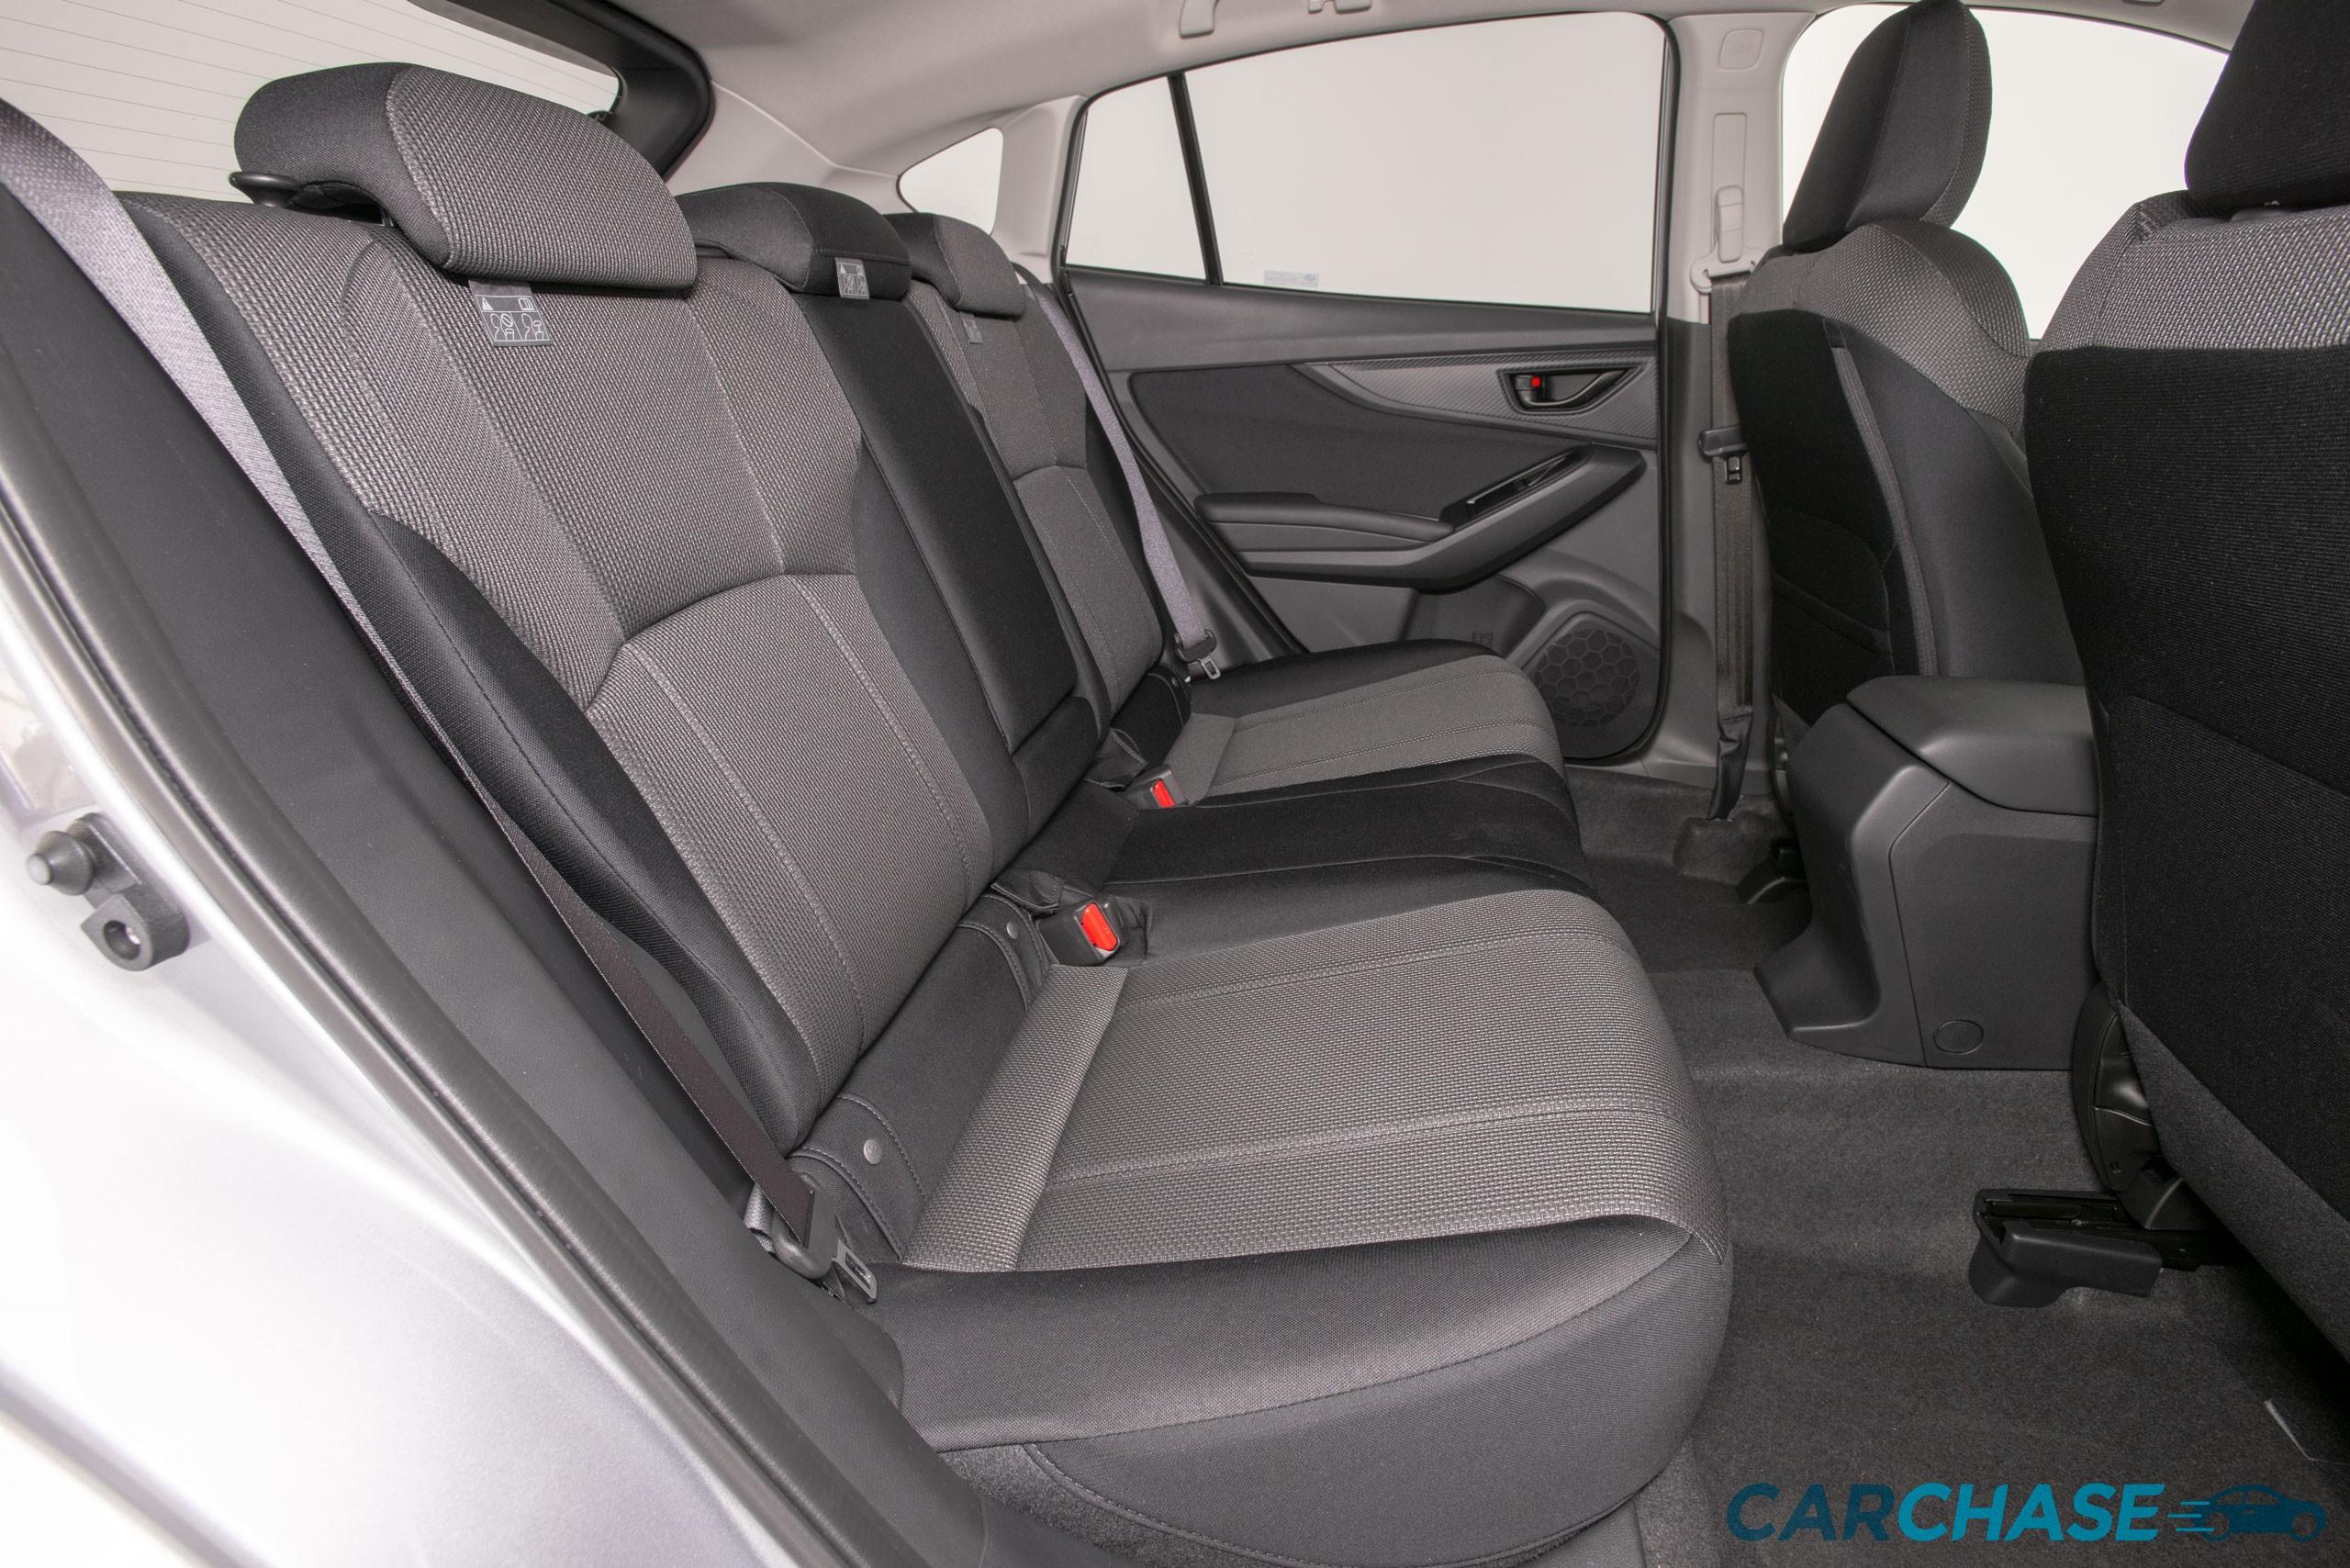 Image of driver rear profile of 2018 Subaru Impreza 2.0i